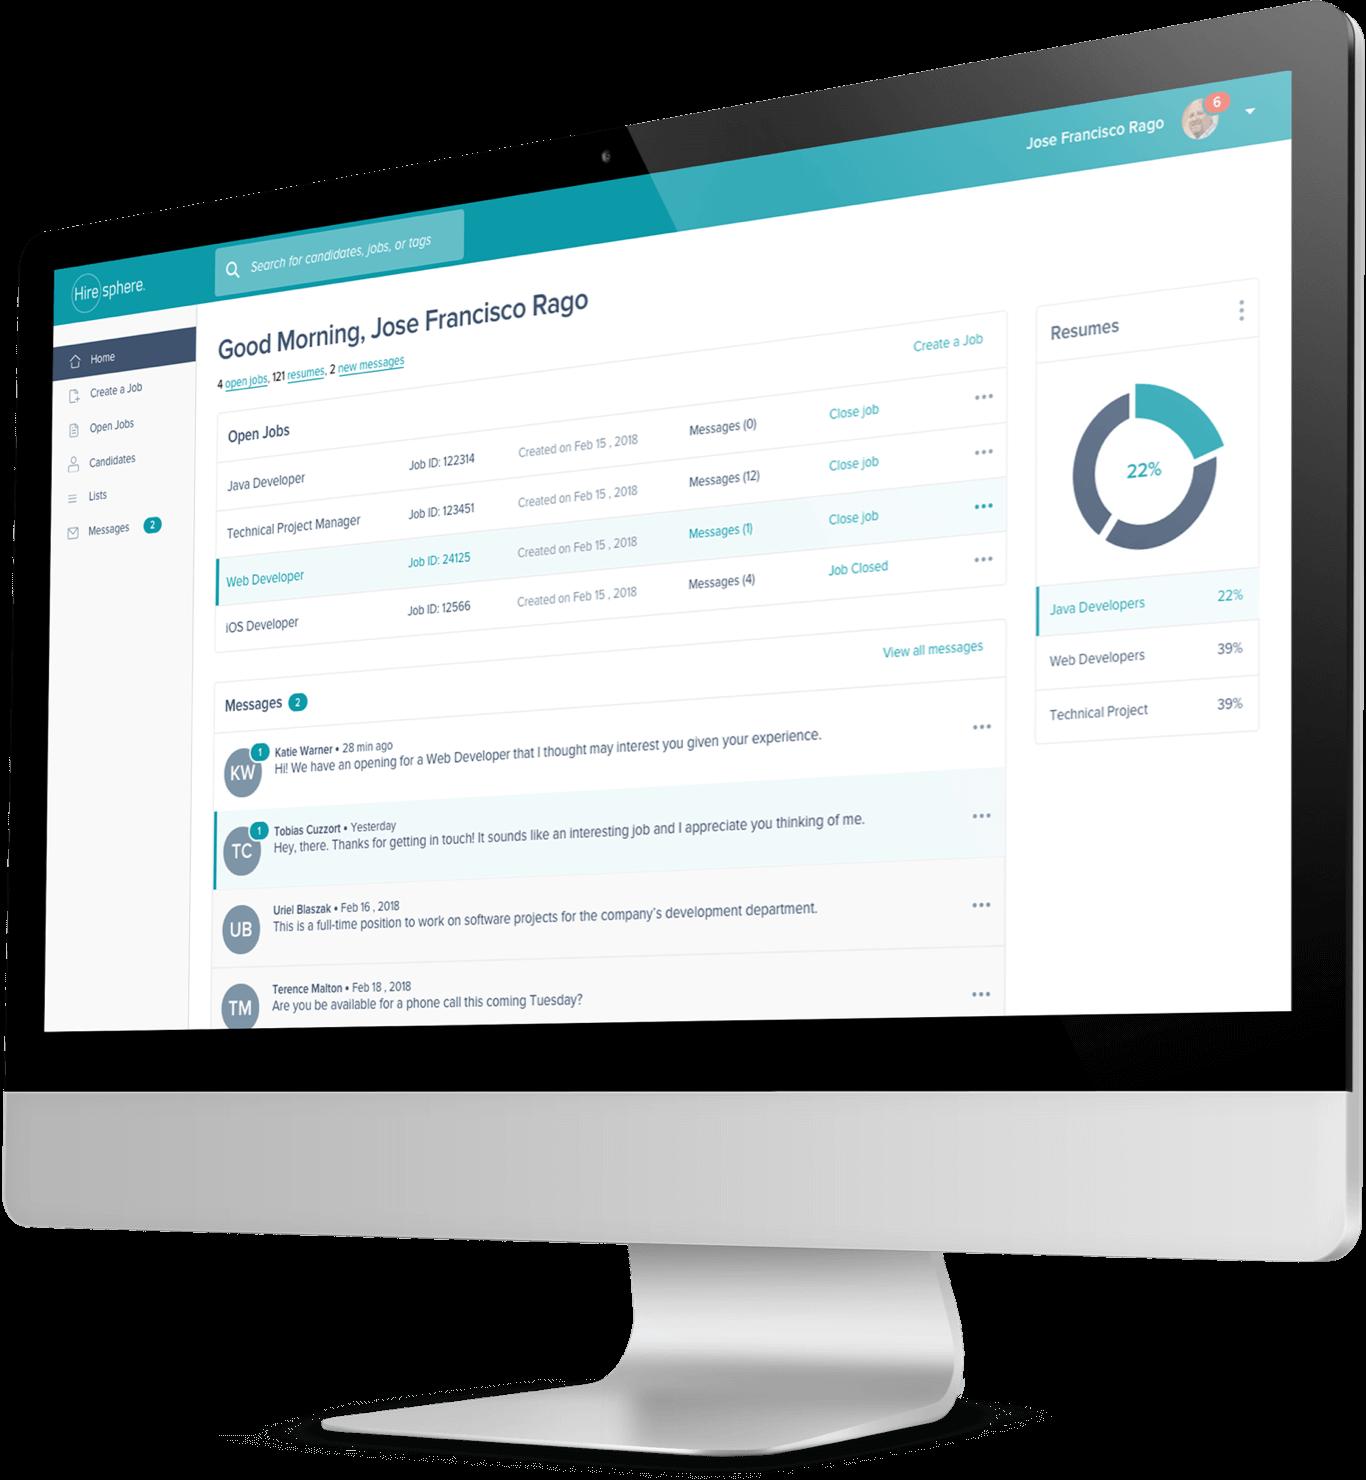 Screenshot of HireSphere's artificial intelligence platform shown on a desktop